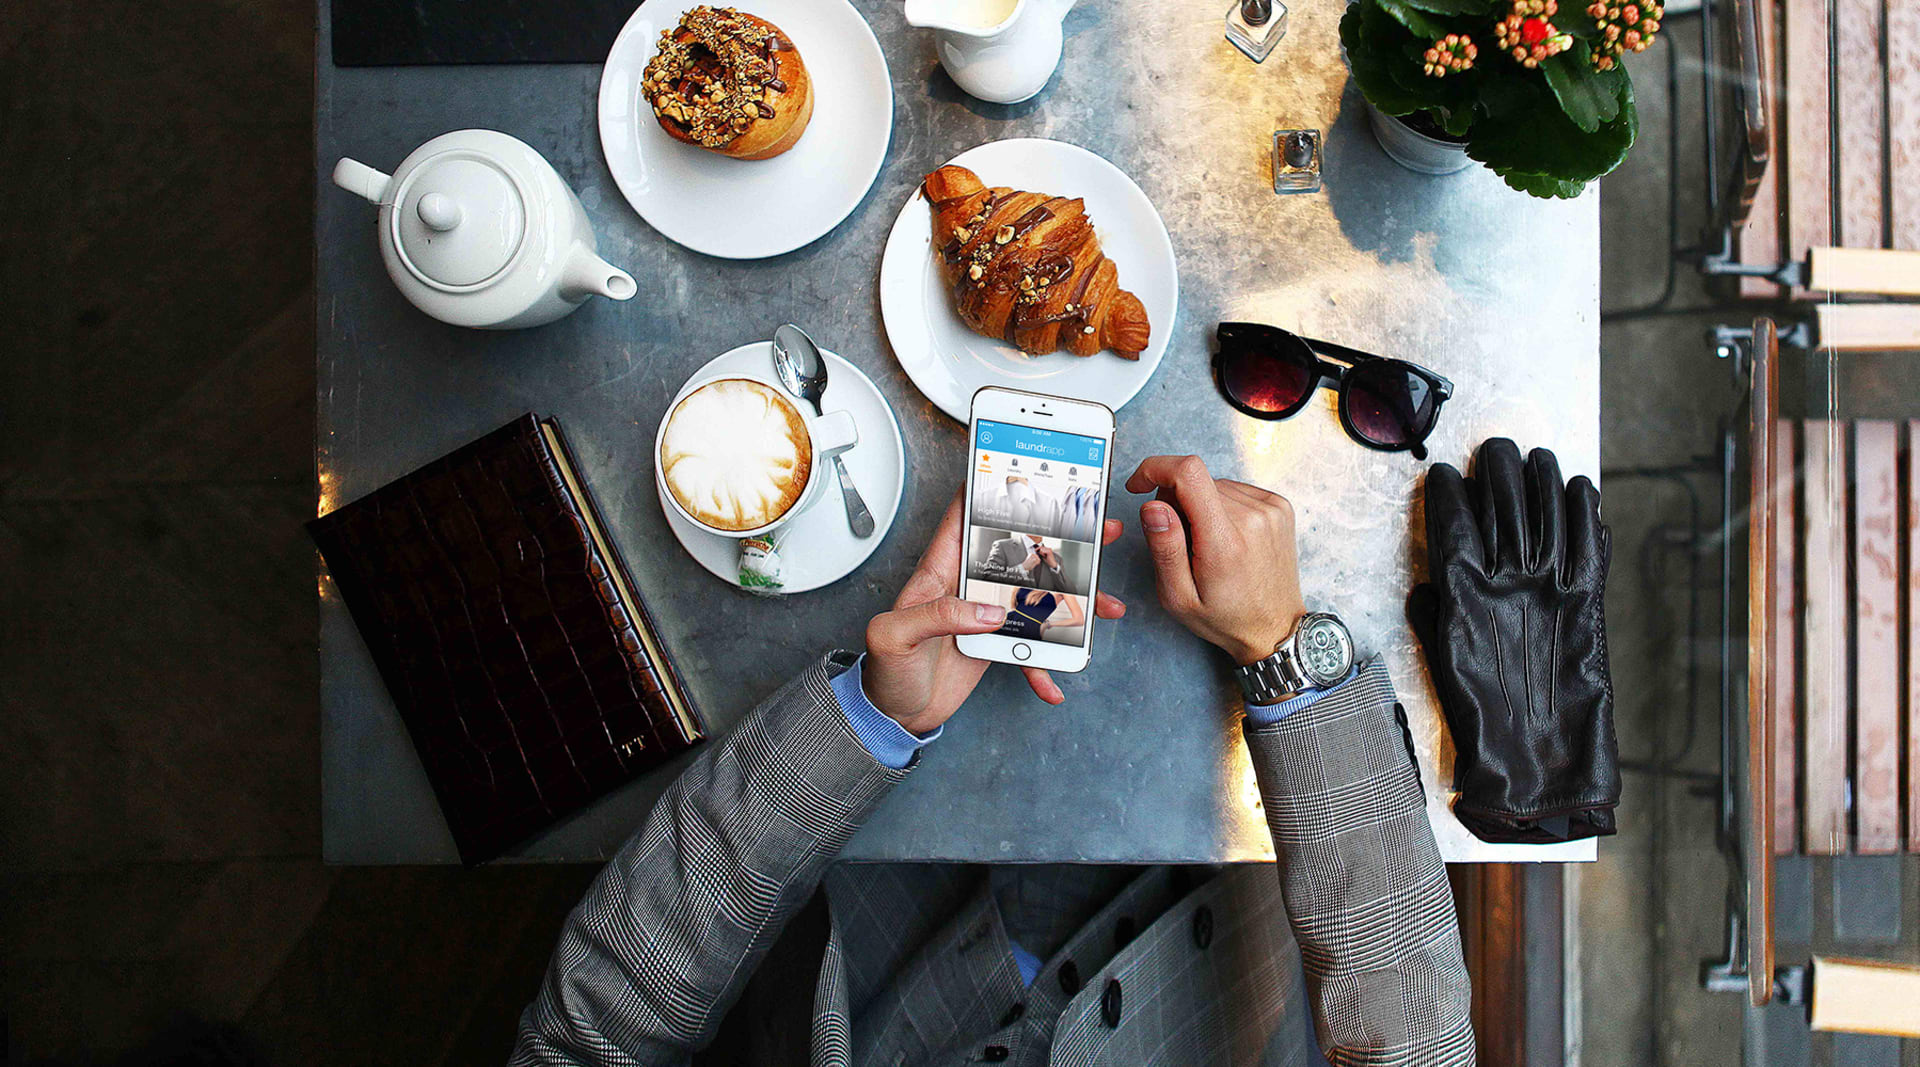 WEB Laundrapp App Product Images 7